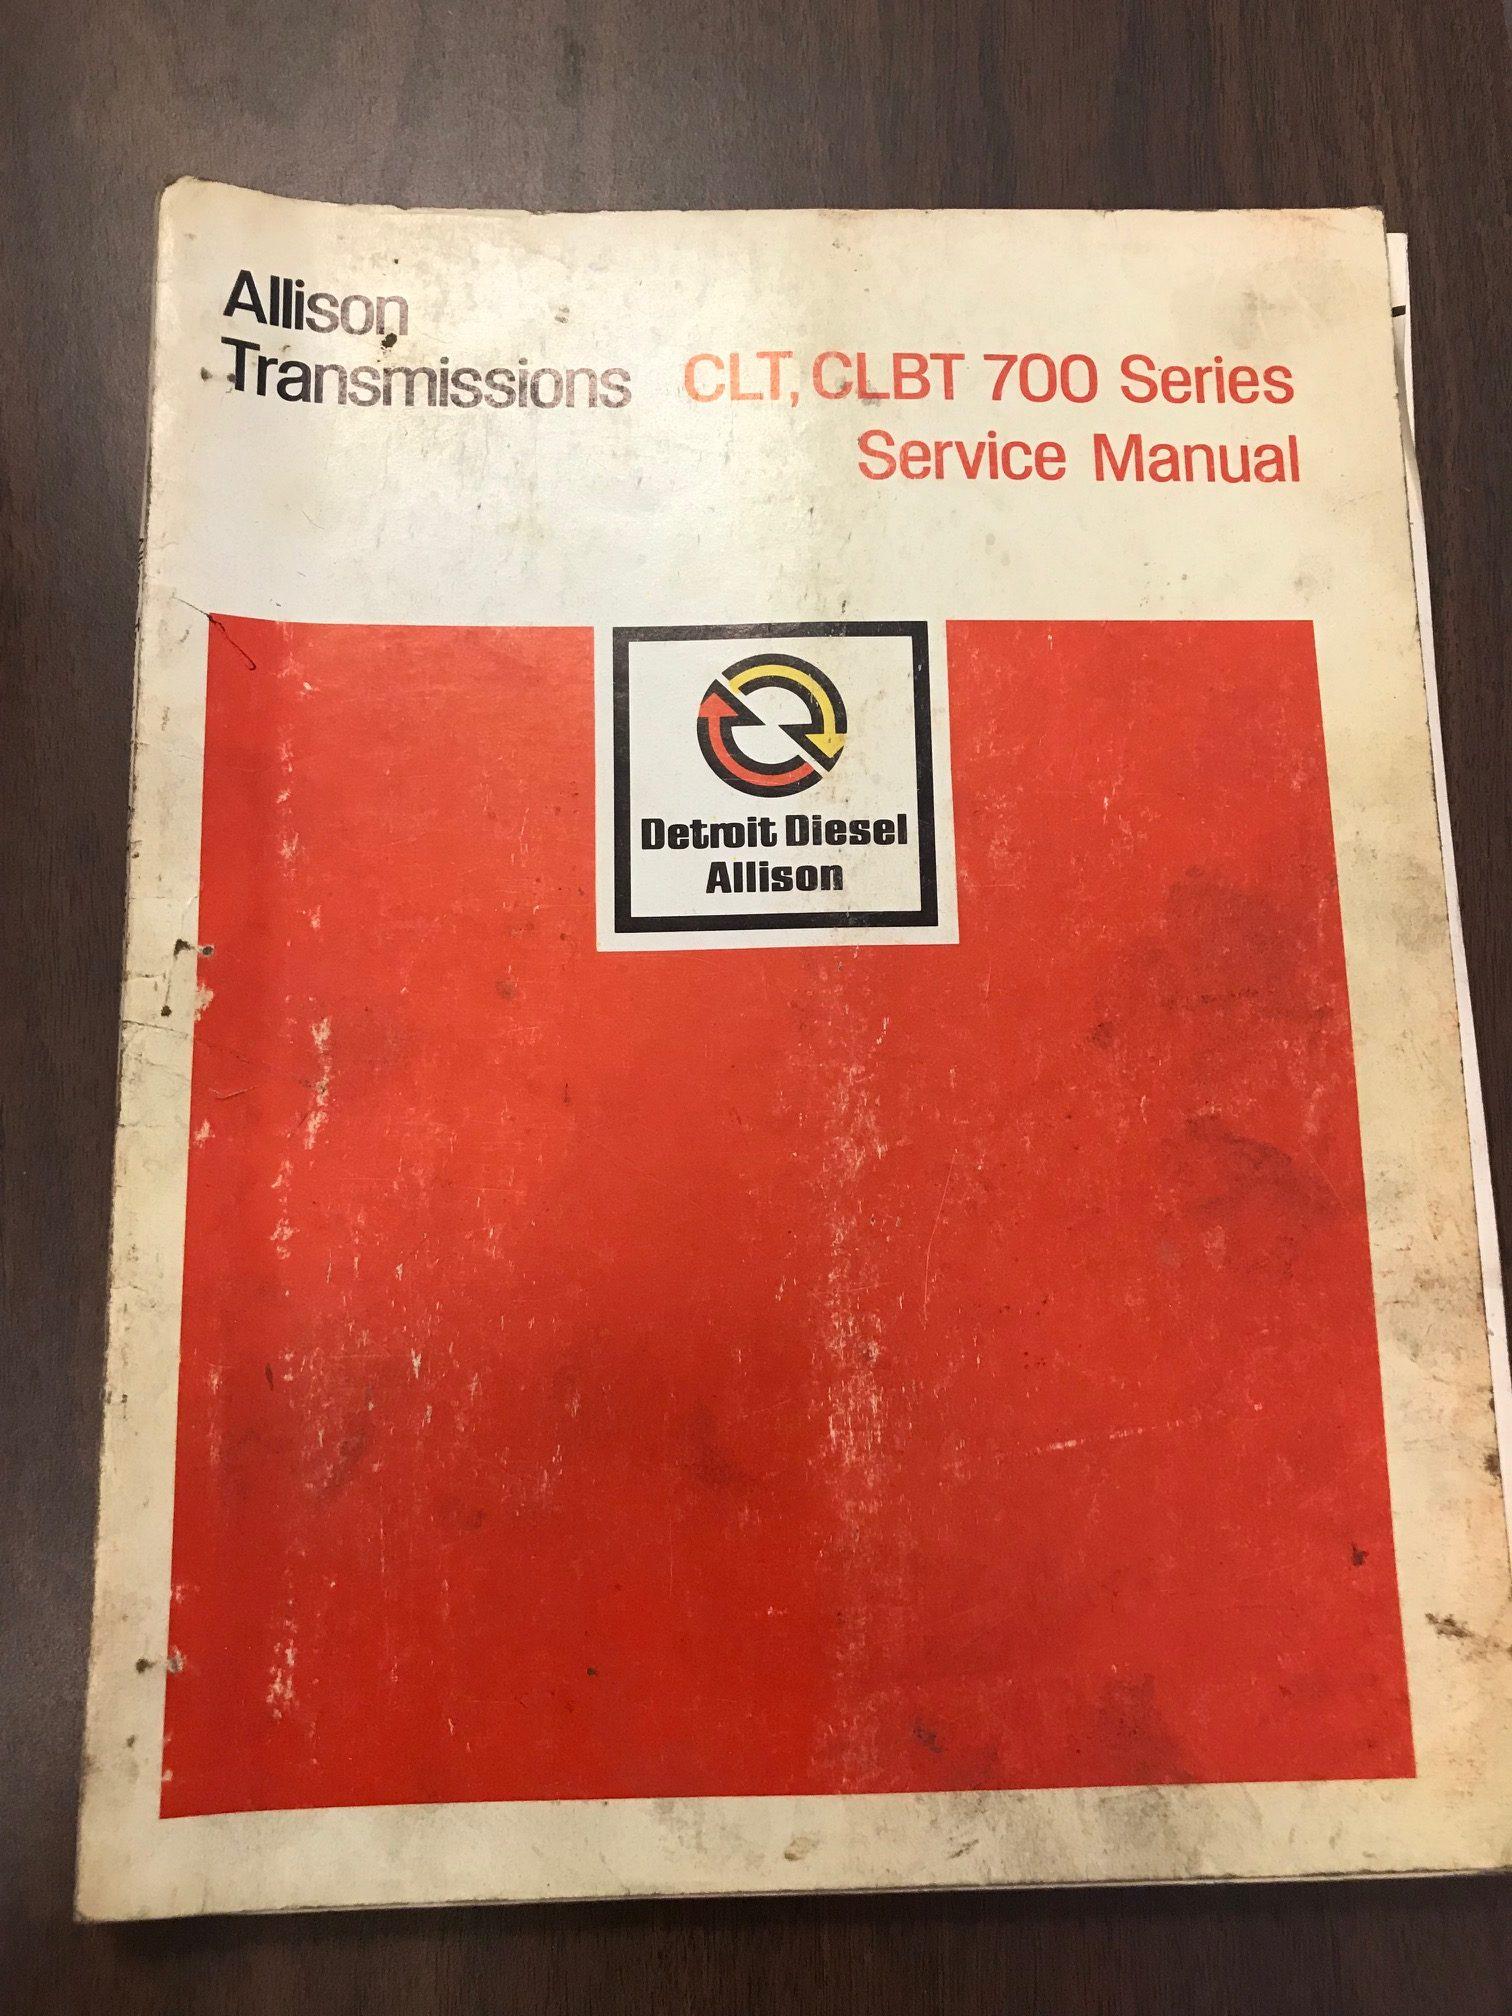 Cummins jetscan 4096 manual ebook array cummins jetscan 4096 manual ebook rh cummins jetscan 4096 manual ebook argodata us fandeluxe Choice Image